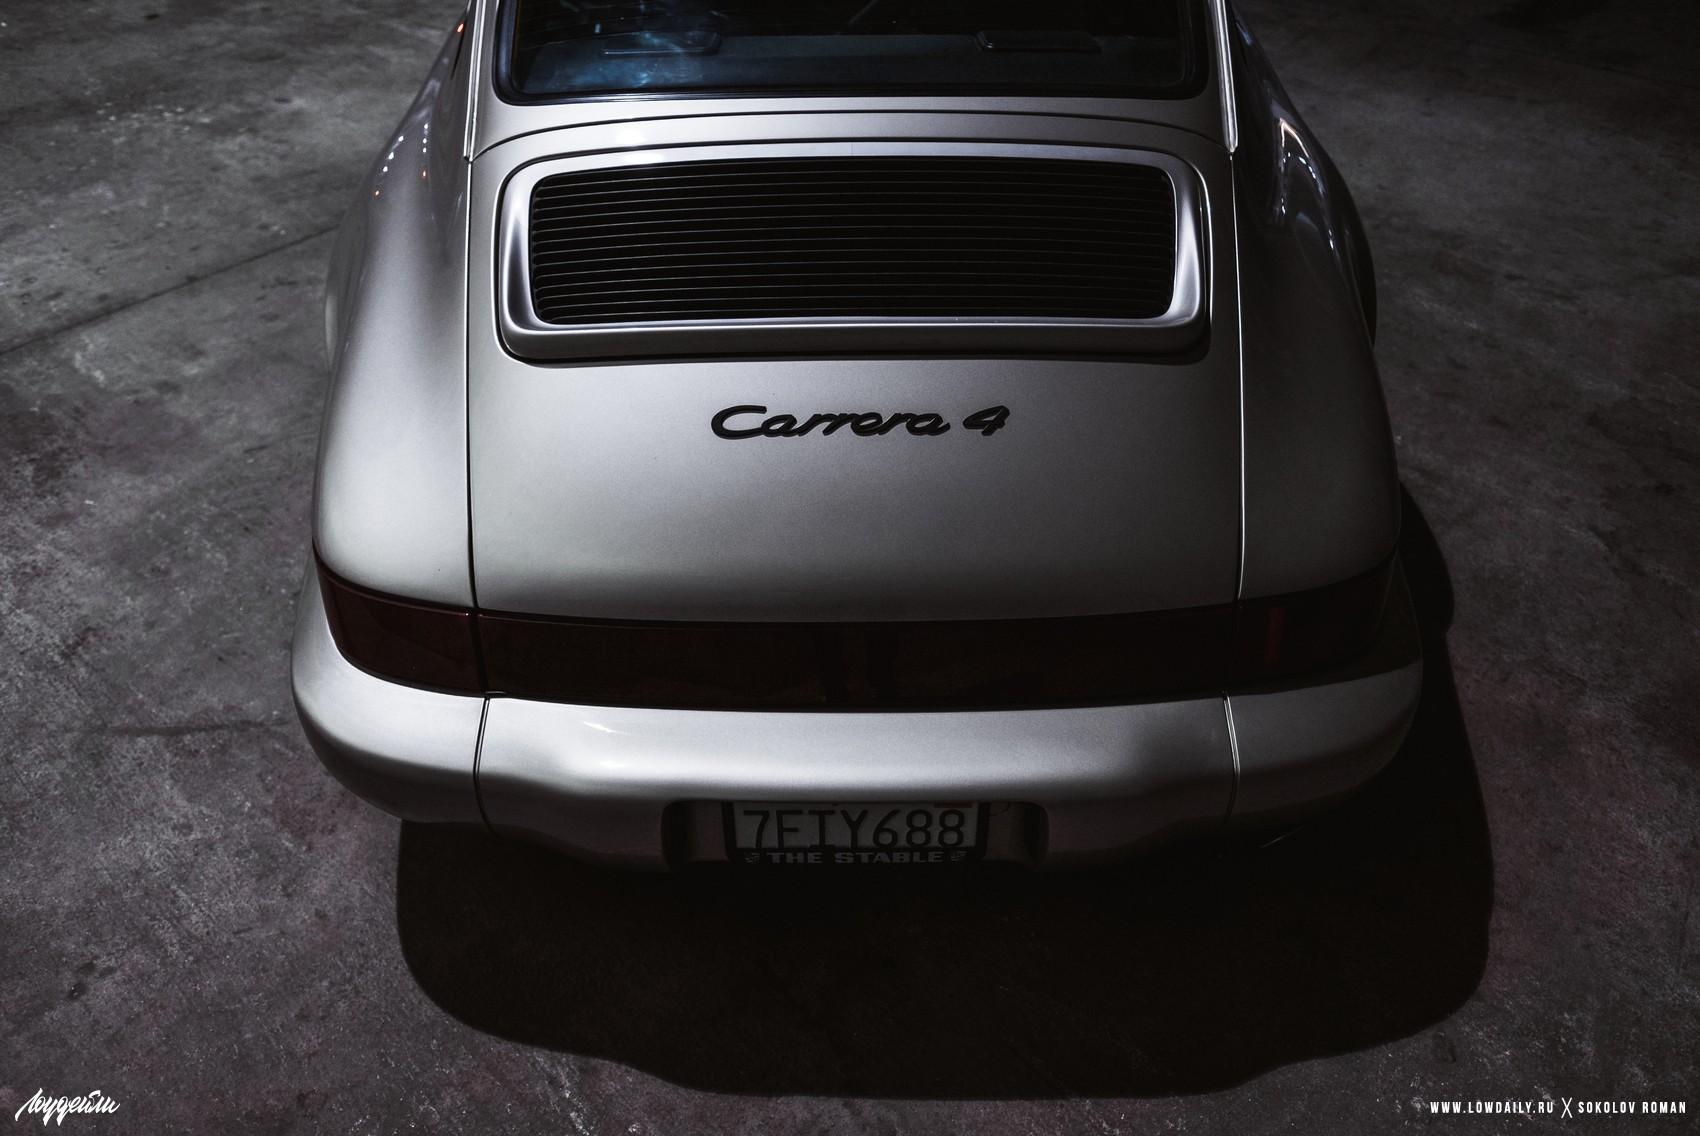 1989 Porsche Carrera 4 (964) DSCF3289